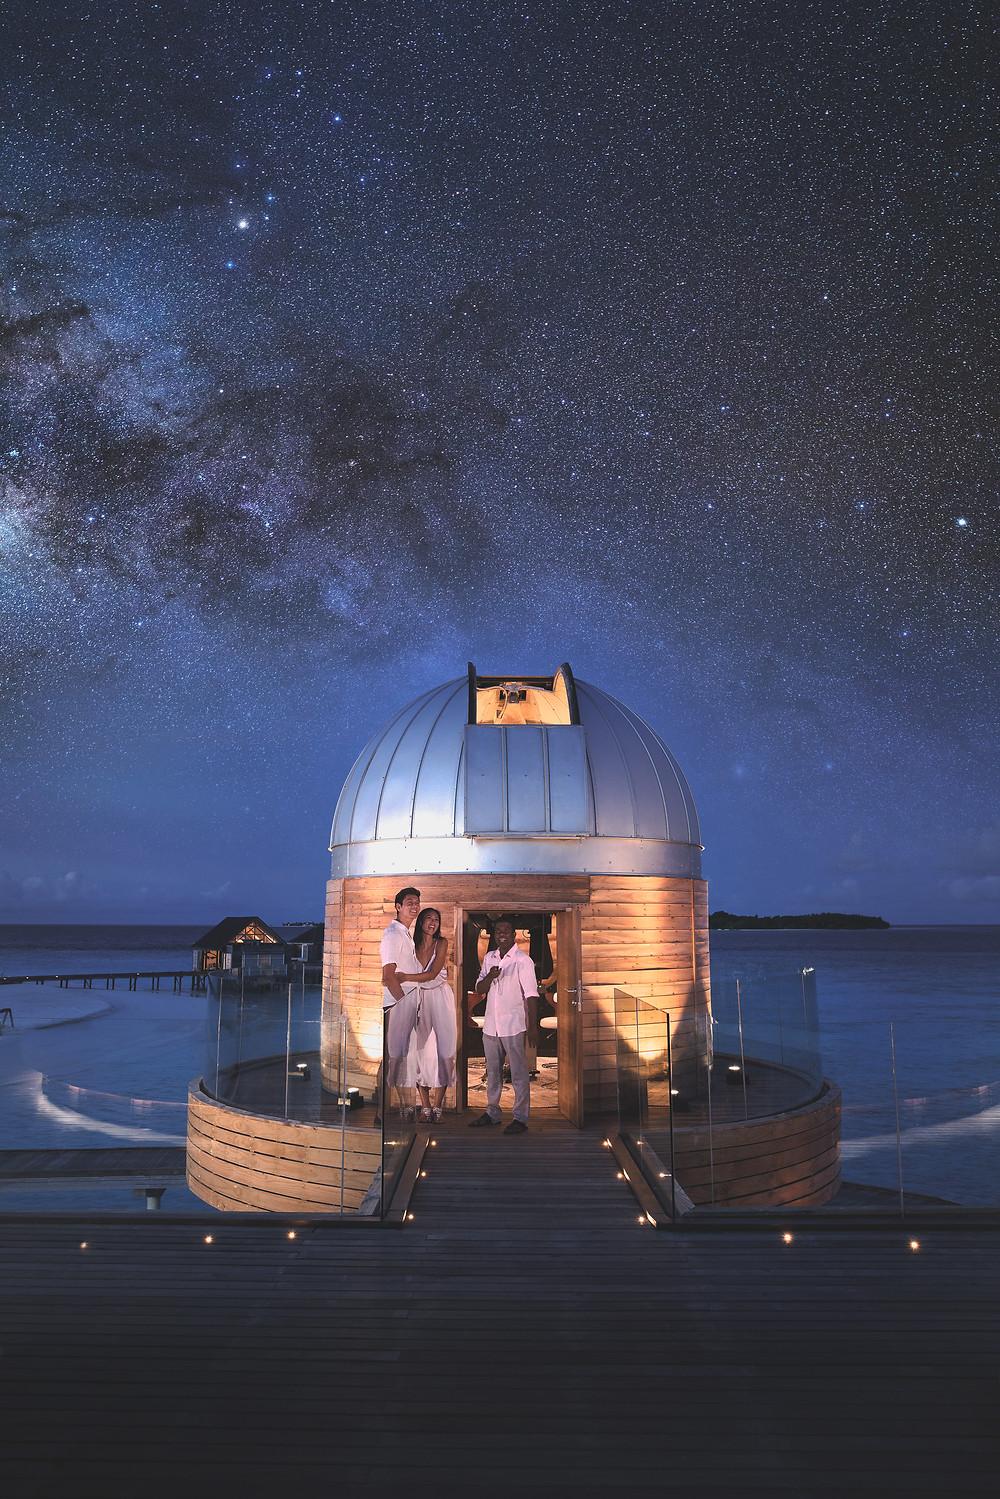 Anantara Kihavah Maldives Dining SKY